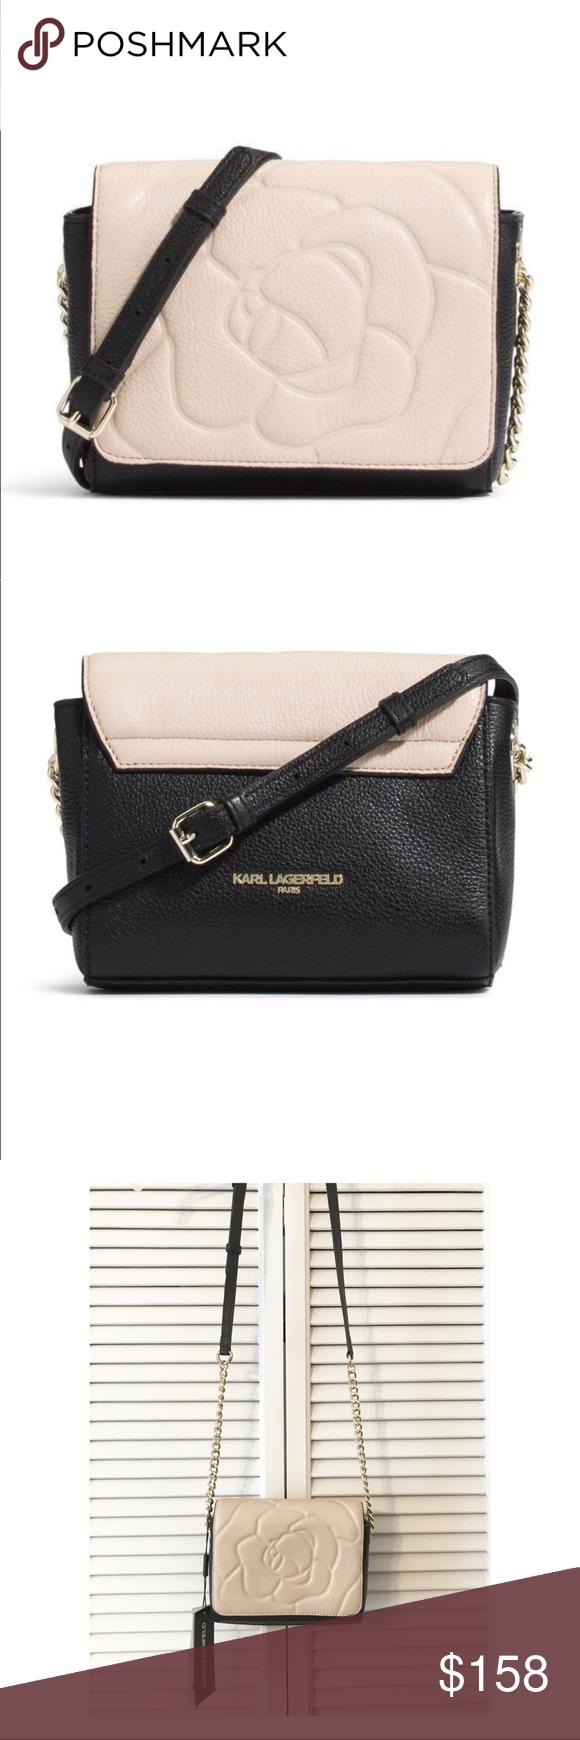 90a01da86cd071 🎉SALE🎉KARL LAGERFELD PARIS Crossbody KARL LAGERFELD PARIS Flora Leather  Crossbody Bag NWT Leather